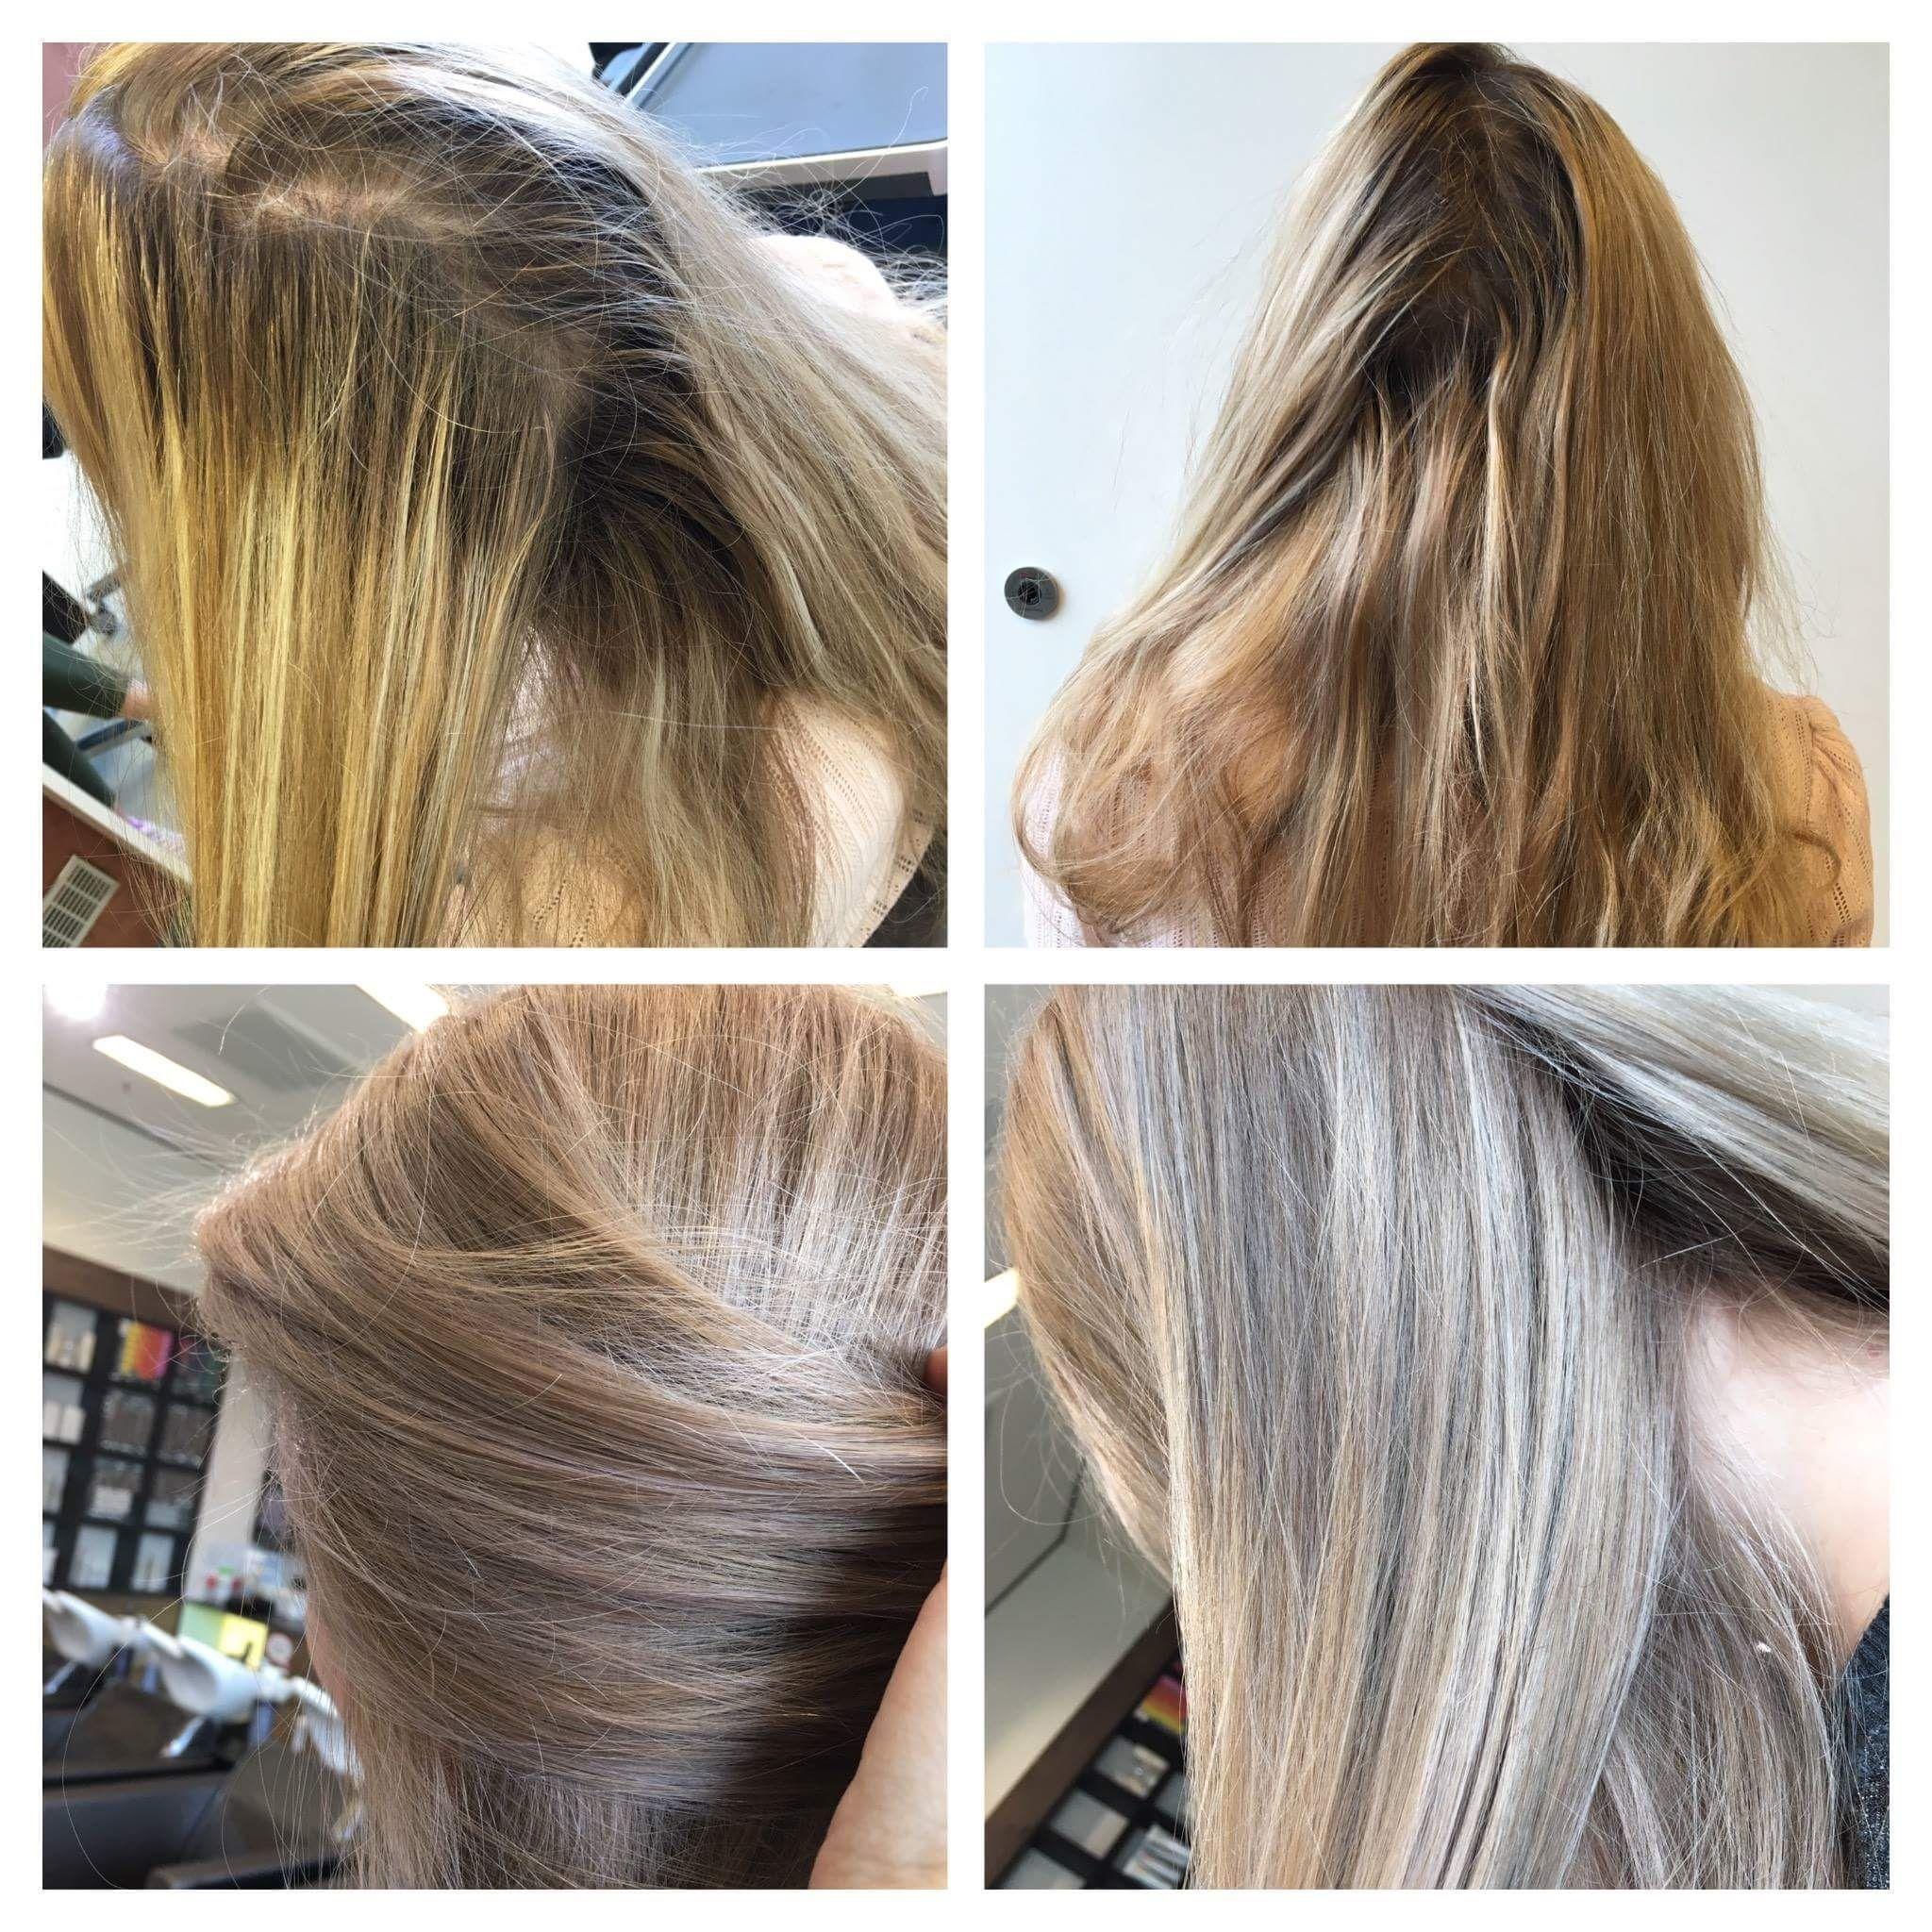 Before And After Vorher Nachher Blond Hair Illumina